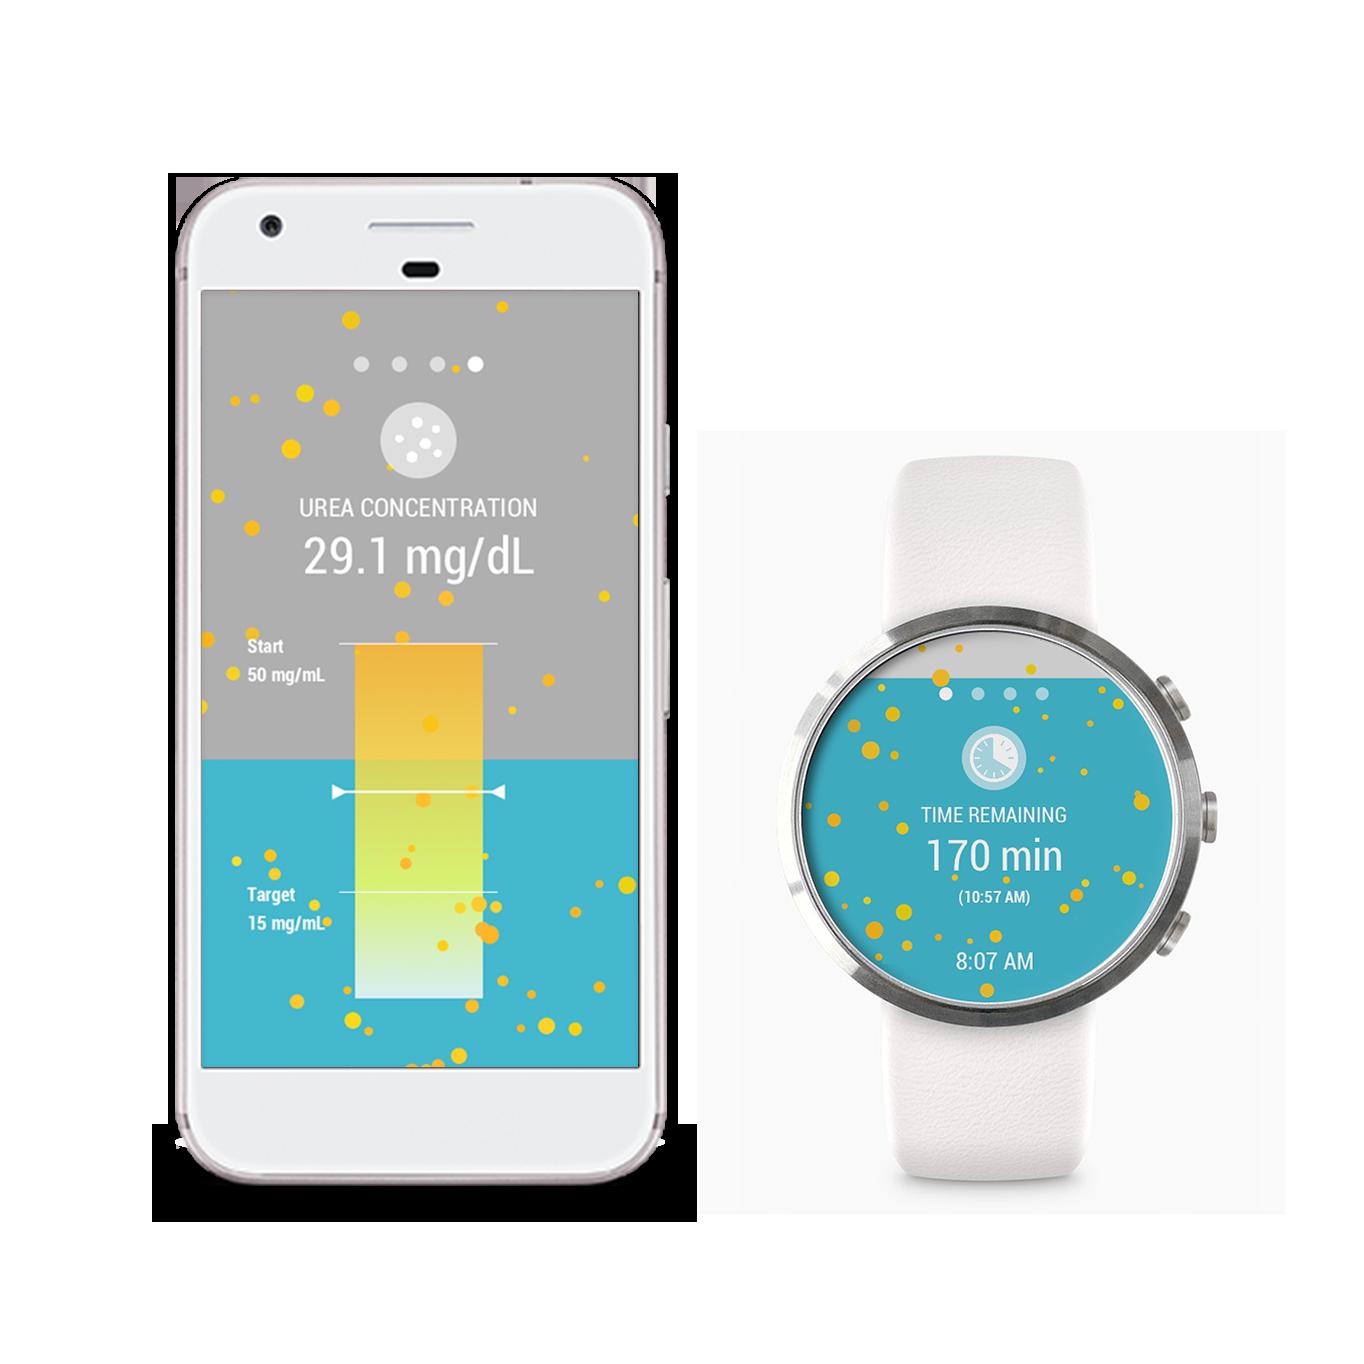 Alternative design concepts: mobile app vs. smart watch app